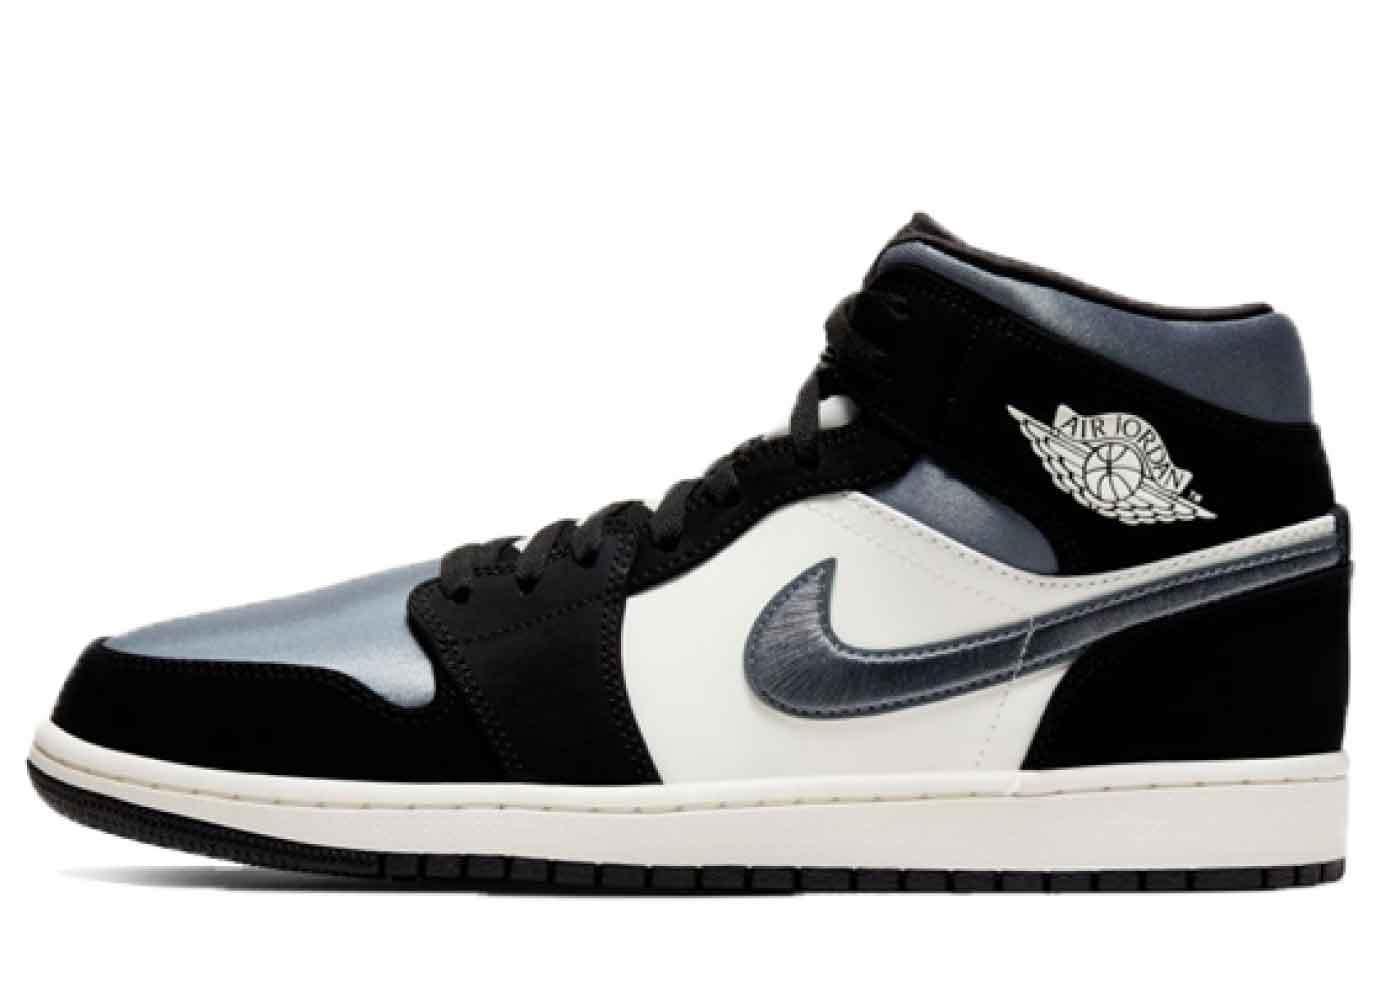 Nike Air Jordan 1 Mid Satin Grey Toeの写真